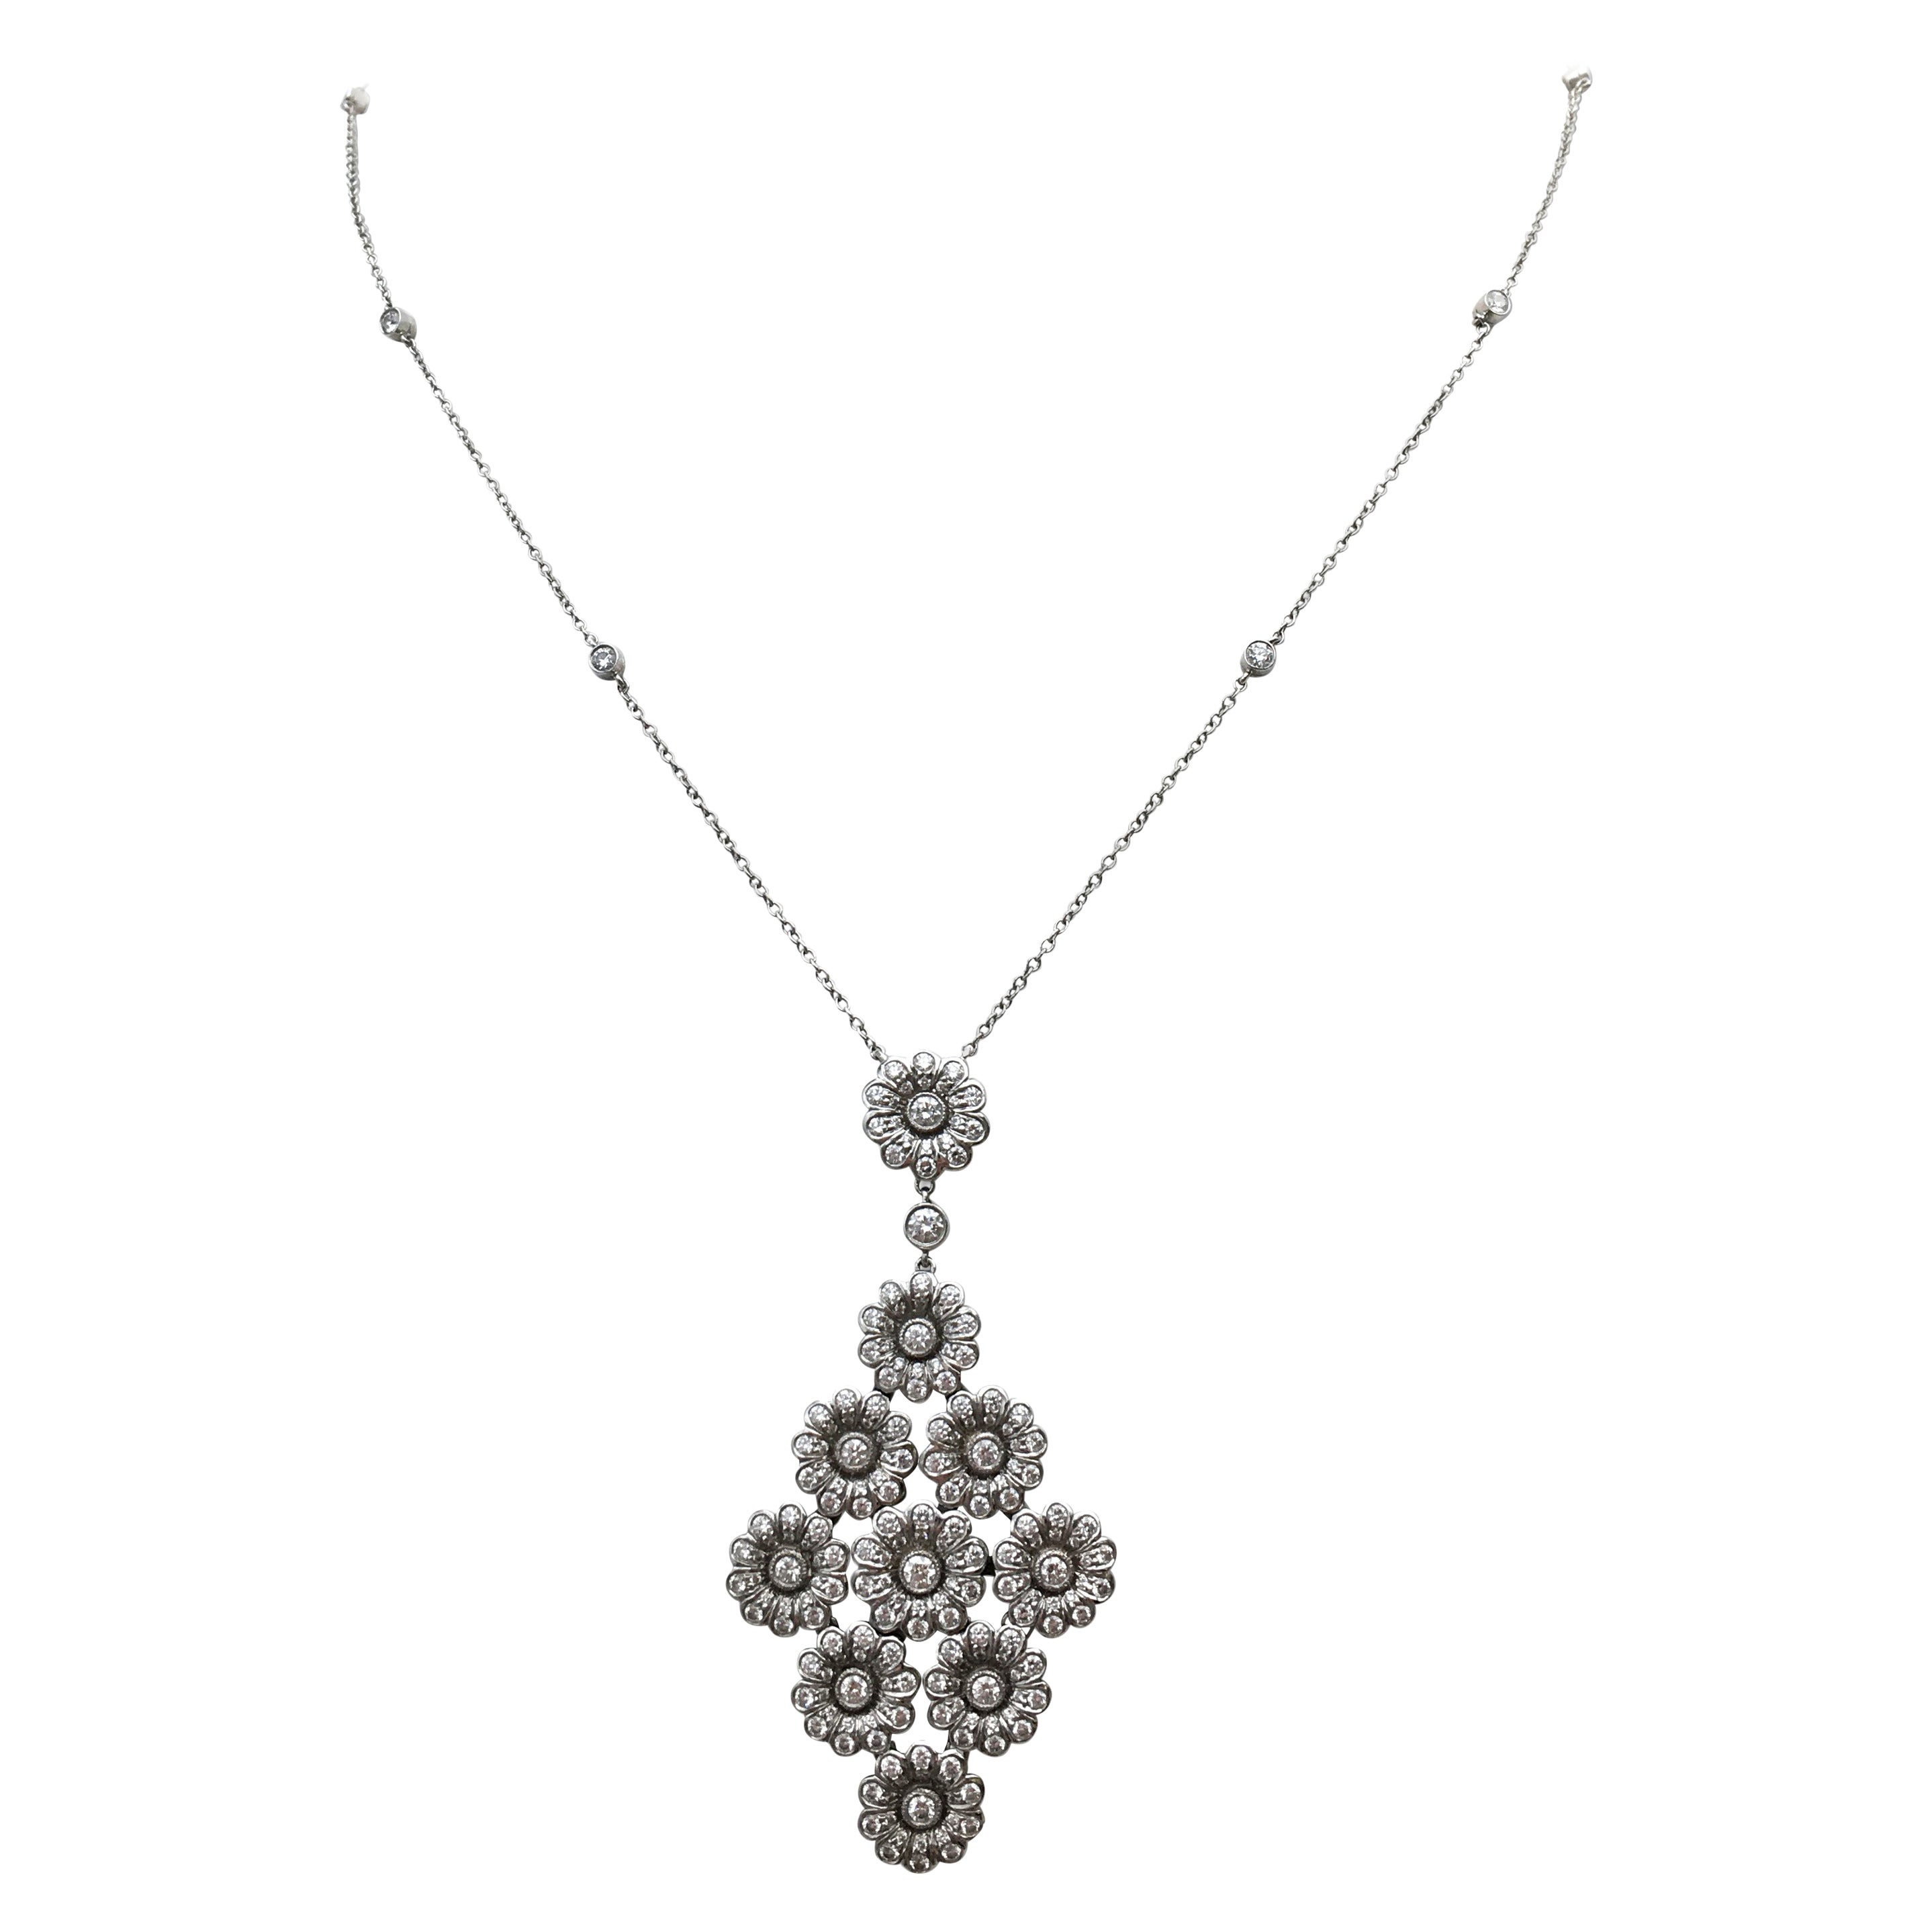 Tiffany & Co. Platinum and Diamond 'Rose' Drop Pendant Necklace